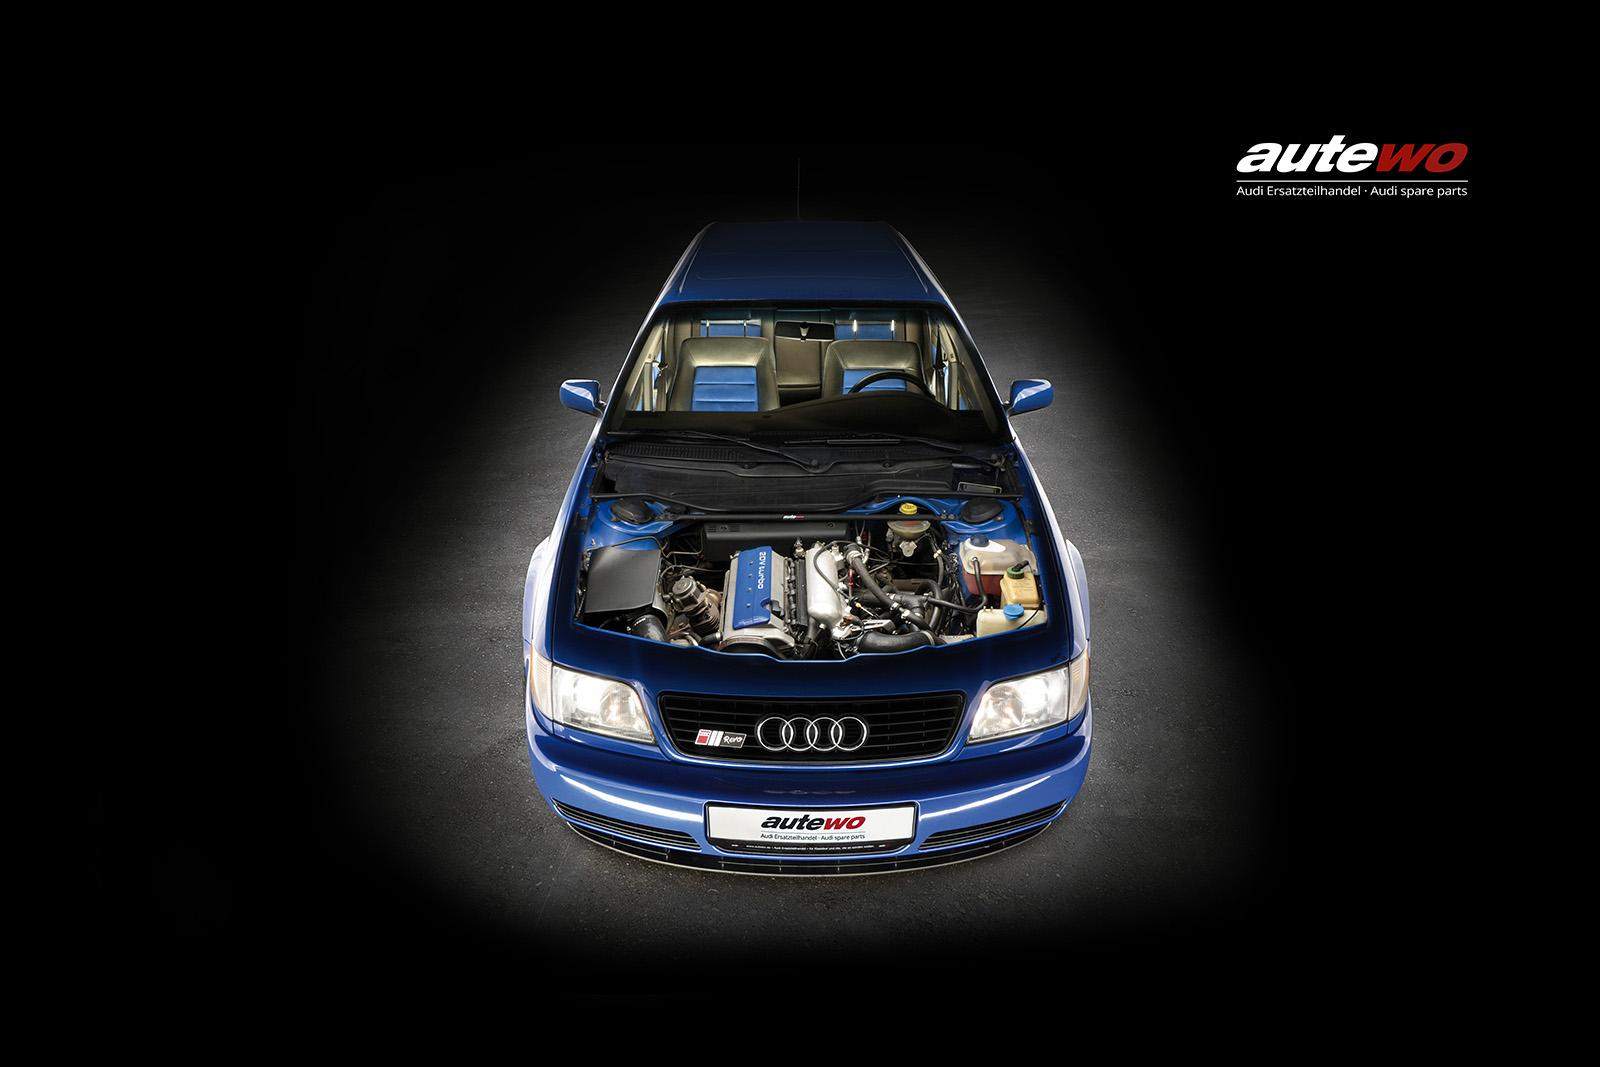 Leinwand-Druck Motiv Audi S6 C4 Avant REVO S SMS Holzkeilrahmen 40x60cm